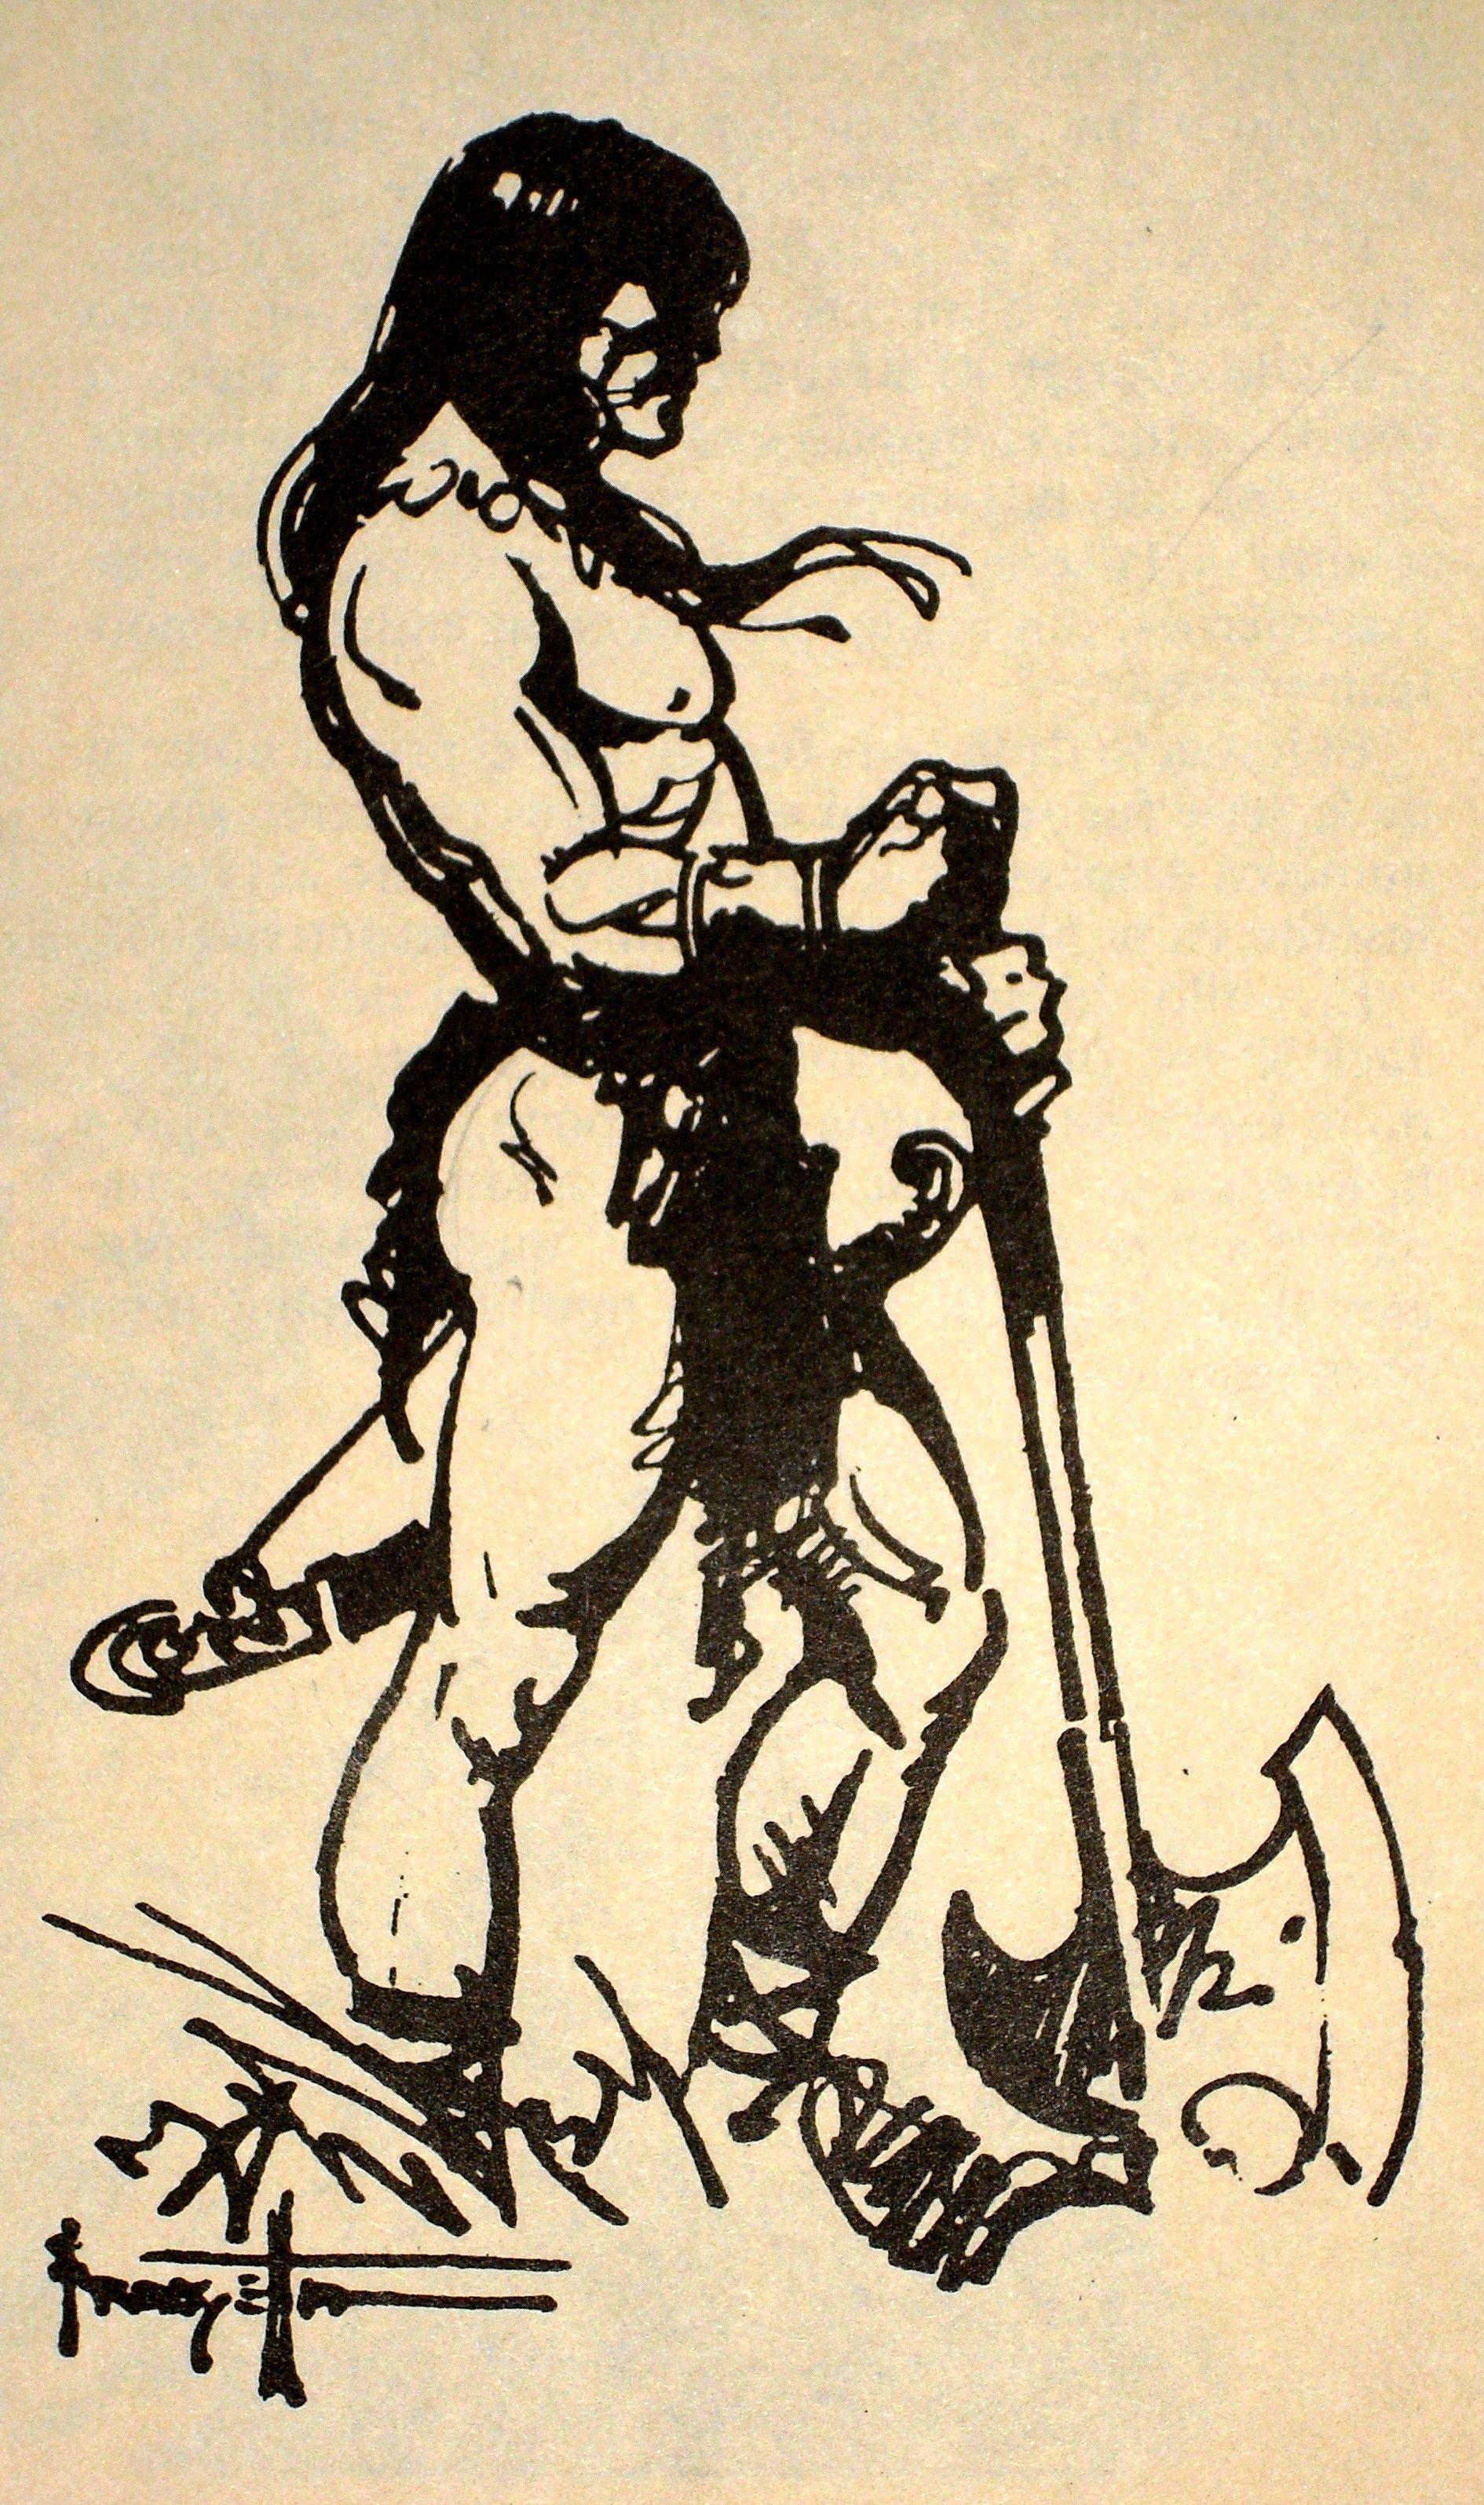 An image. two heroes. Conan by Frank Frazzeta   Frank Frazzeta ...